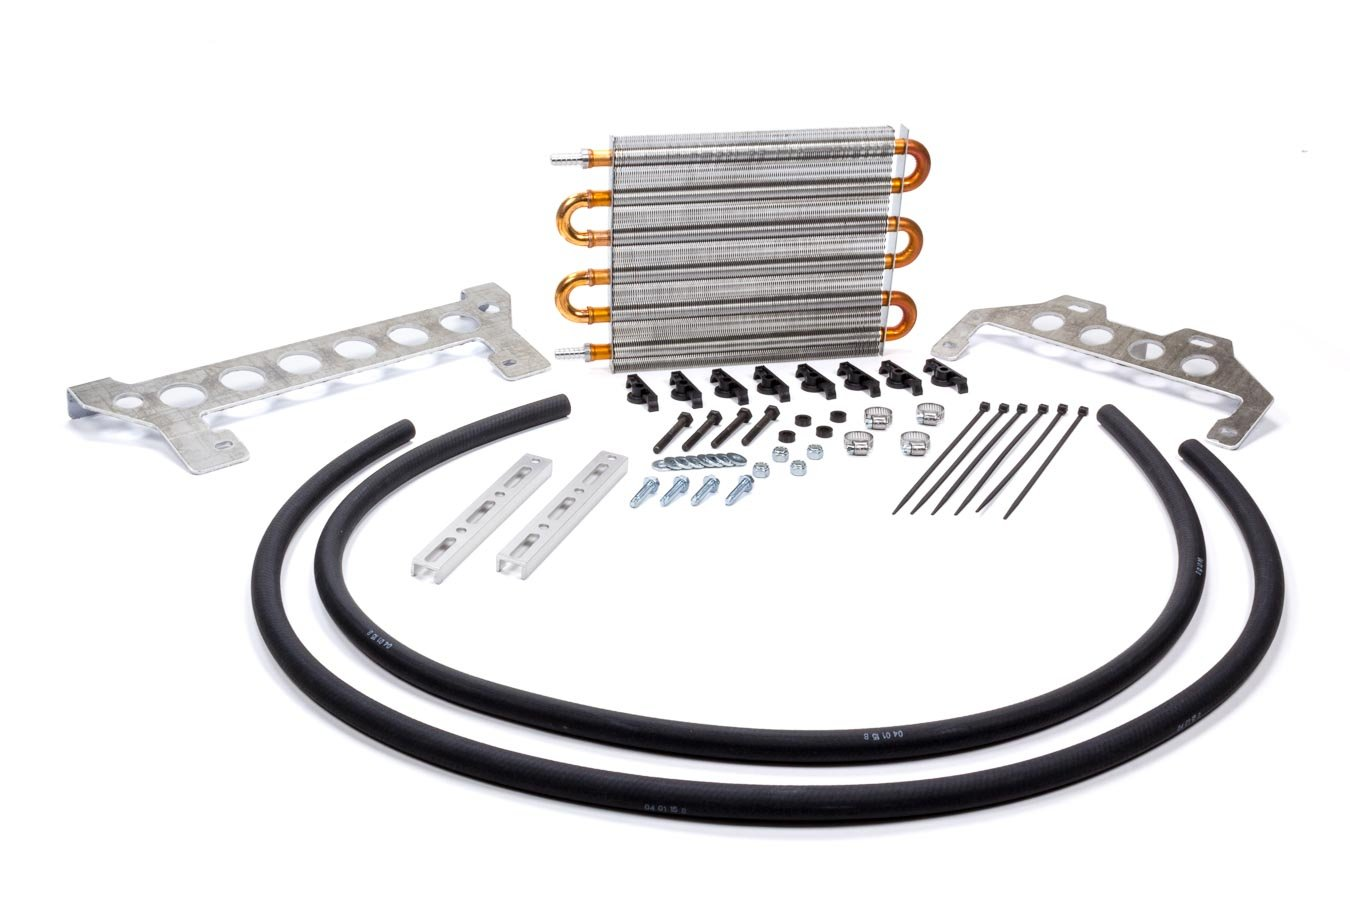 Flex A Lite 4116jk Translife Direct Fit Transmission Flexalite Electric Fan Black Magic Series Coximportcom Cooler For Jeep Wrangler Jk Automotive